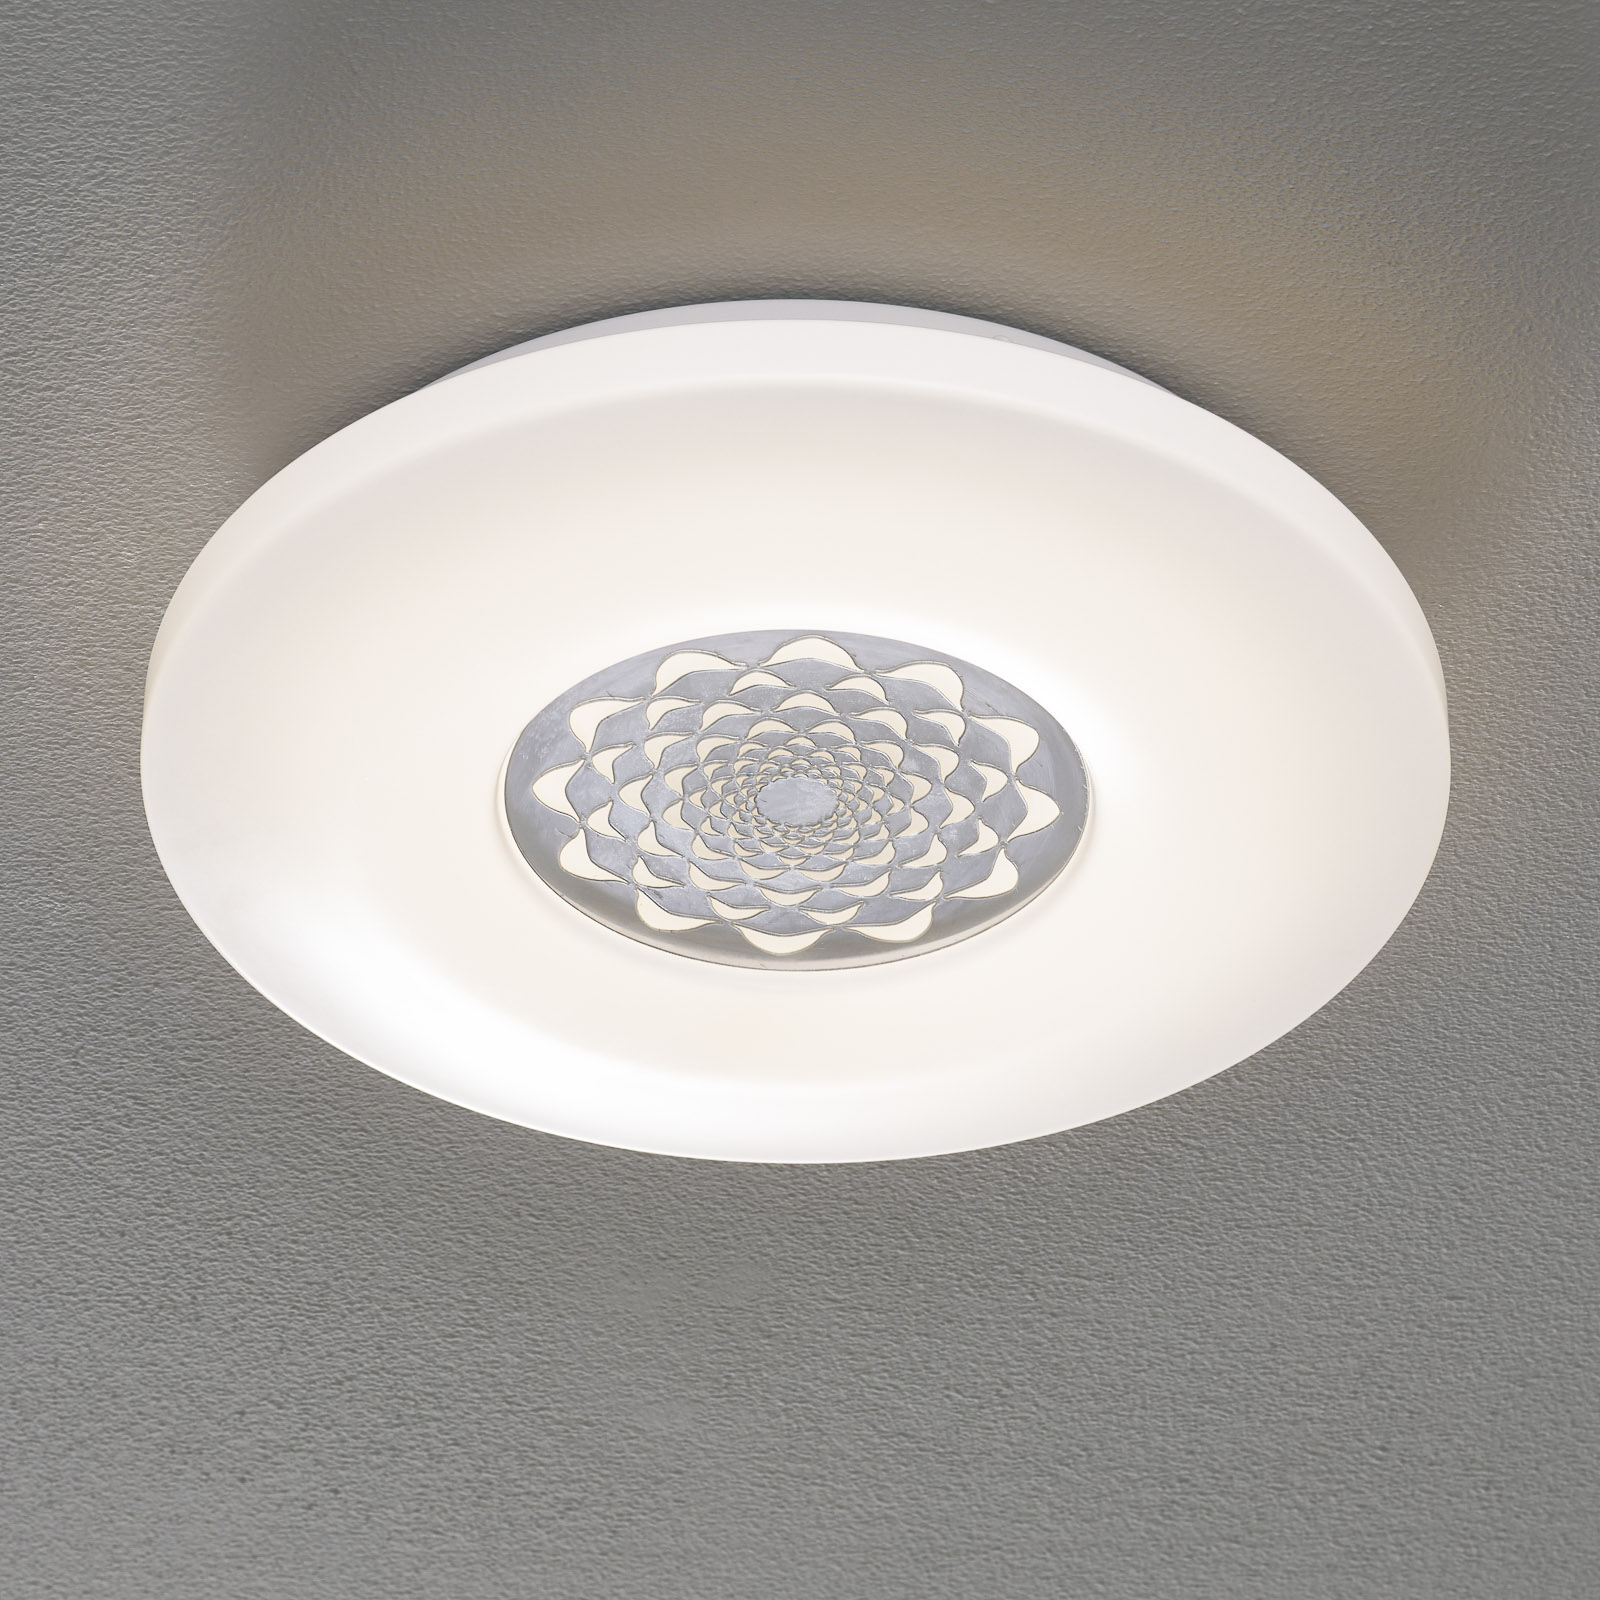 EGLO connect Capasso-C LED-Deckenleuchte mit Motiv